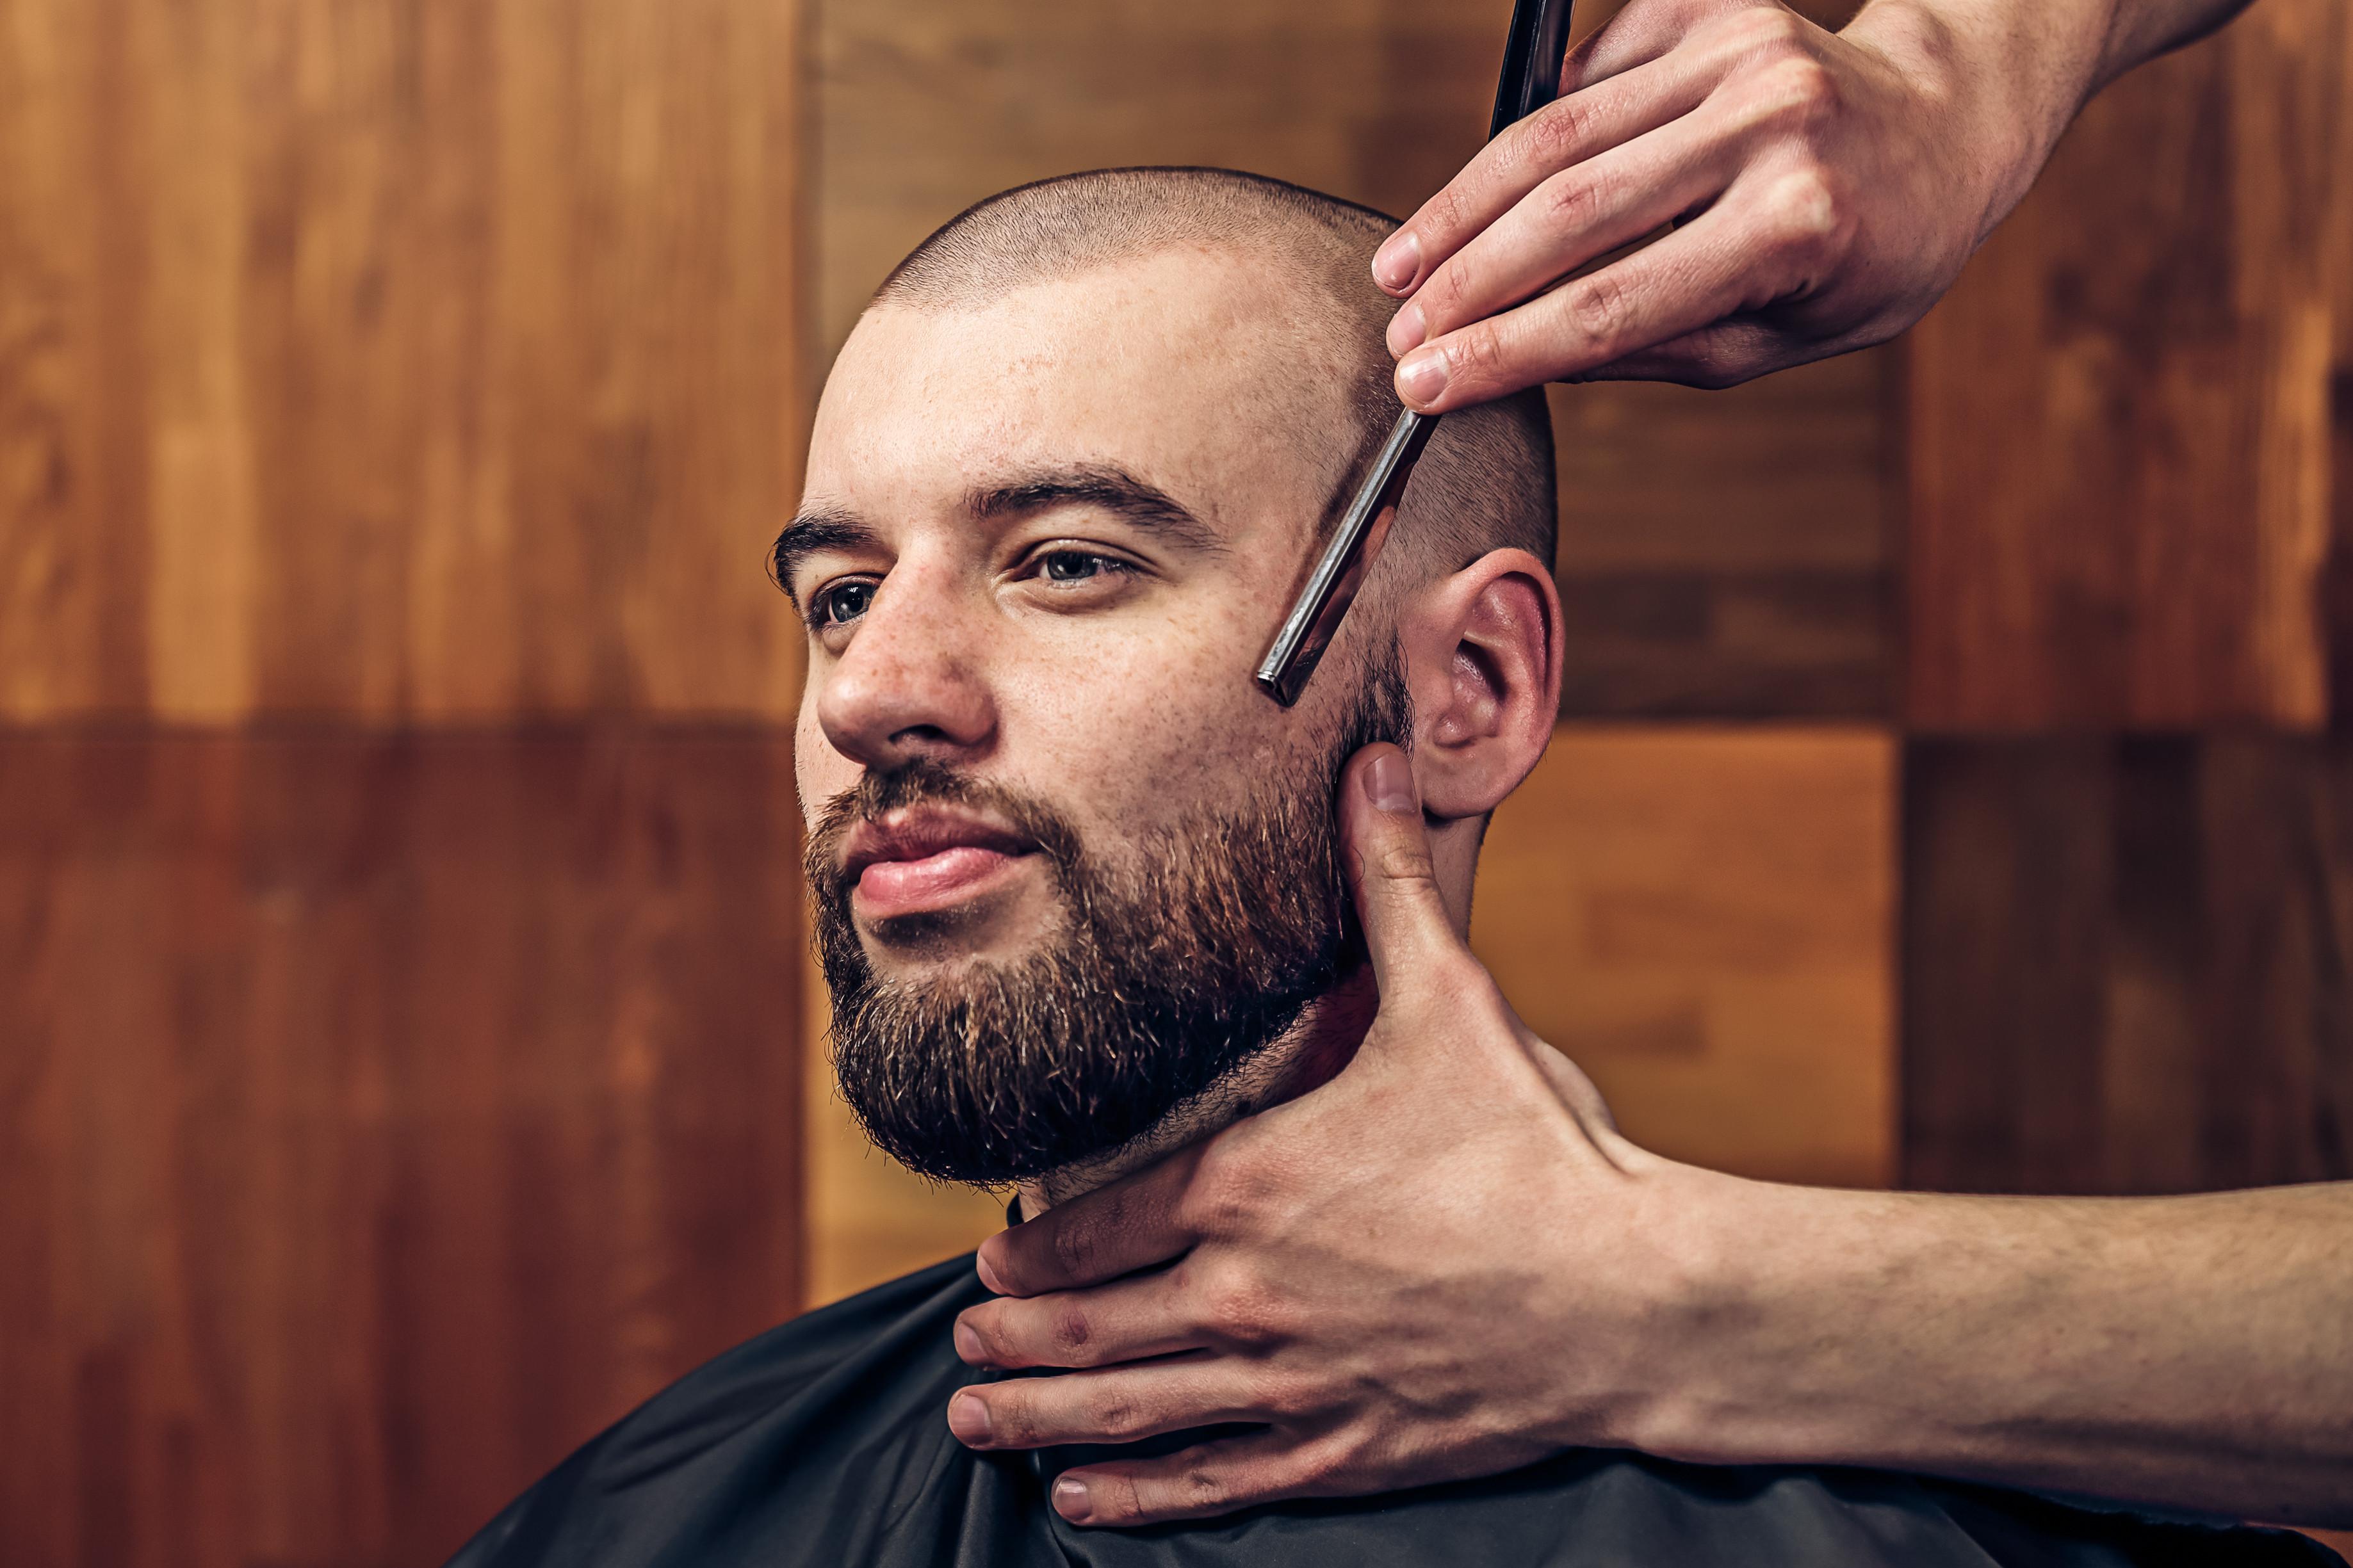 HEAD SHAVE & BEARD TRIM